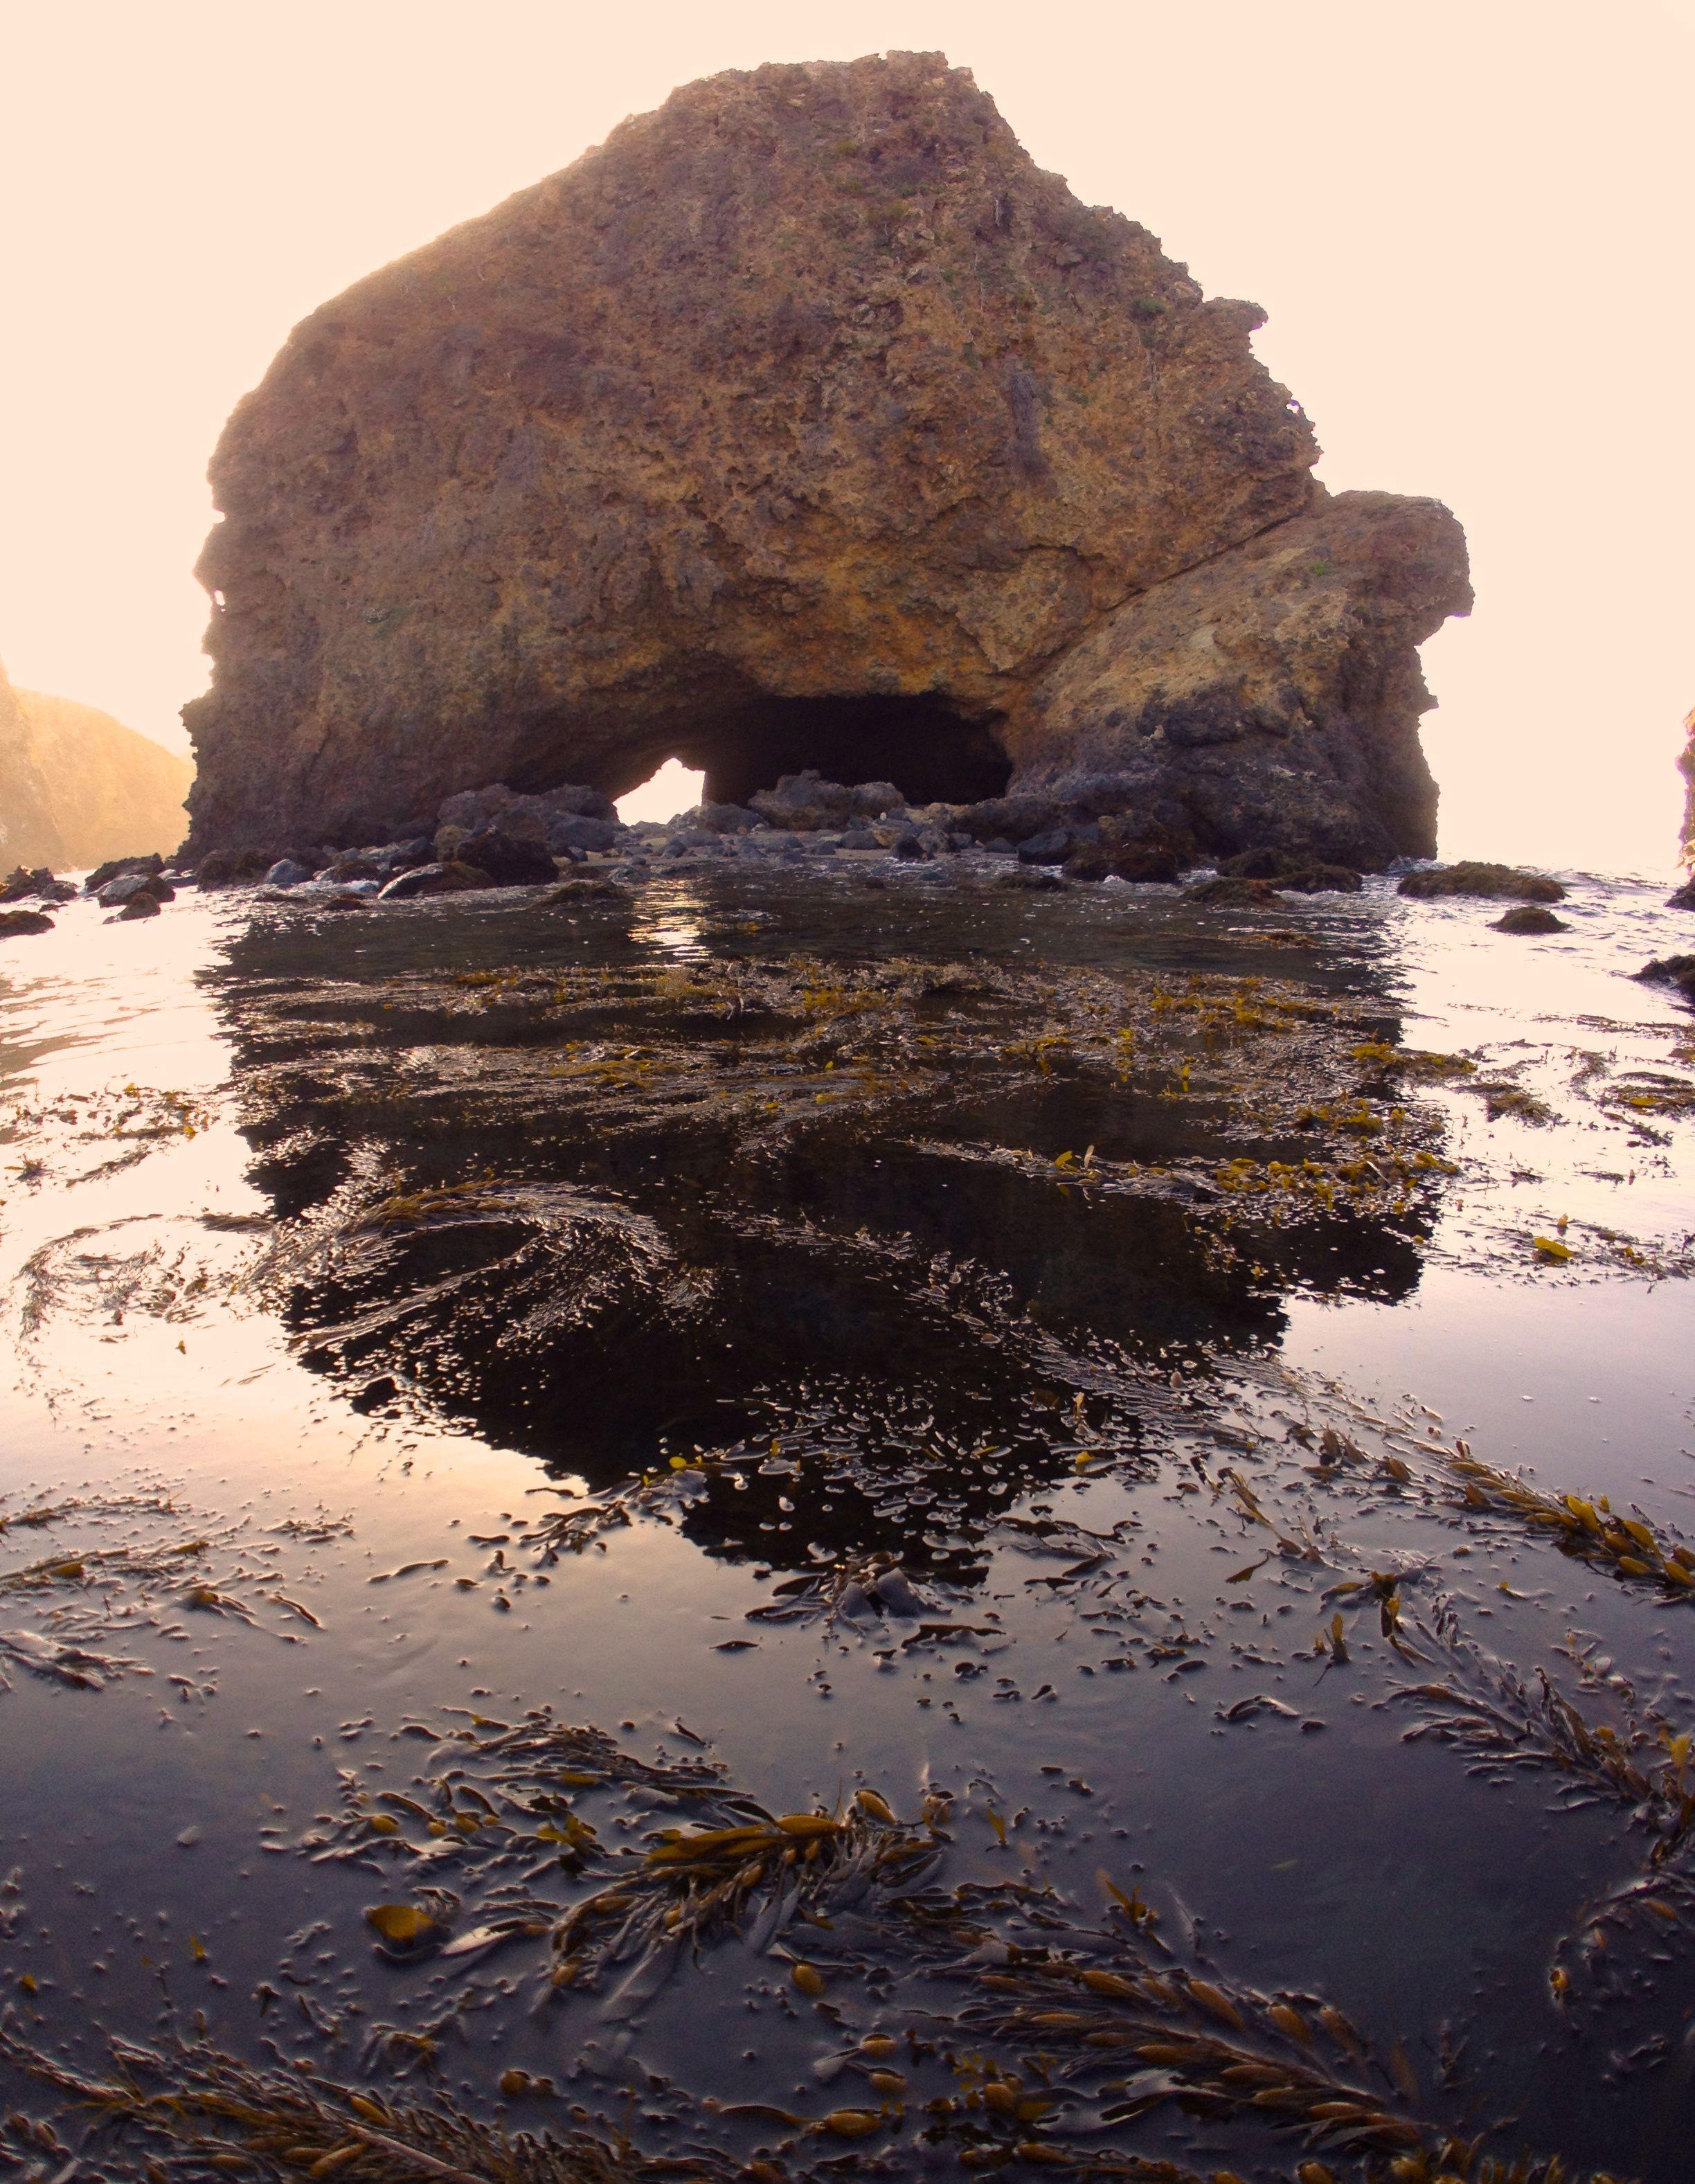 The Rock, Little Scorpion Anchorage, Santa Cruz Island, CA